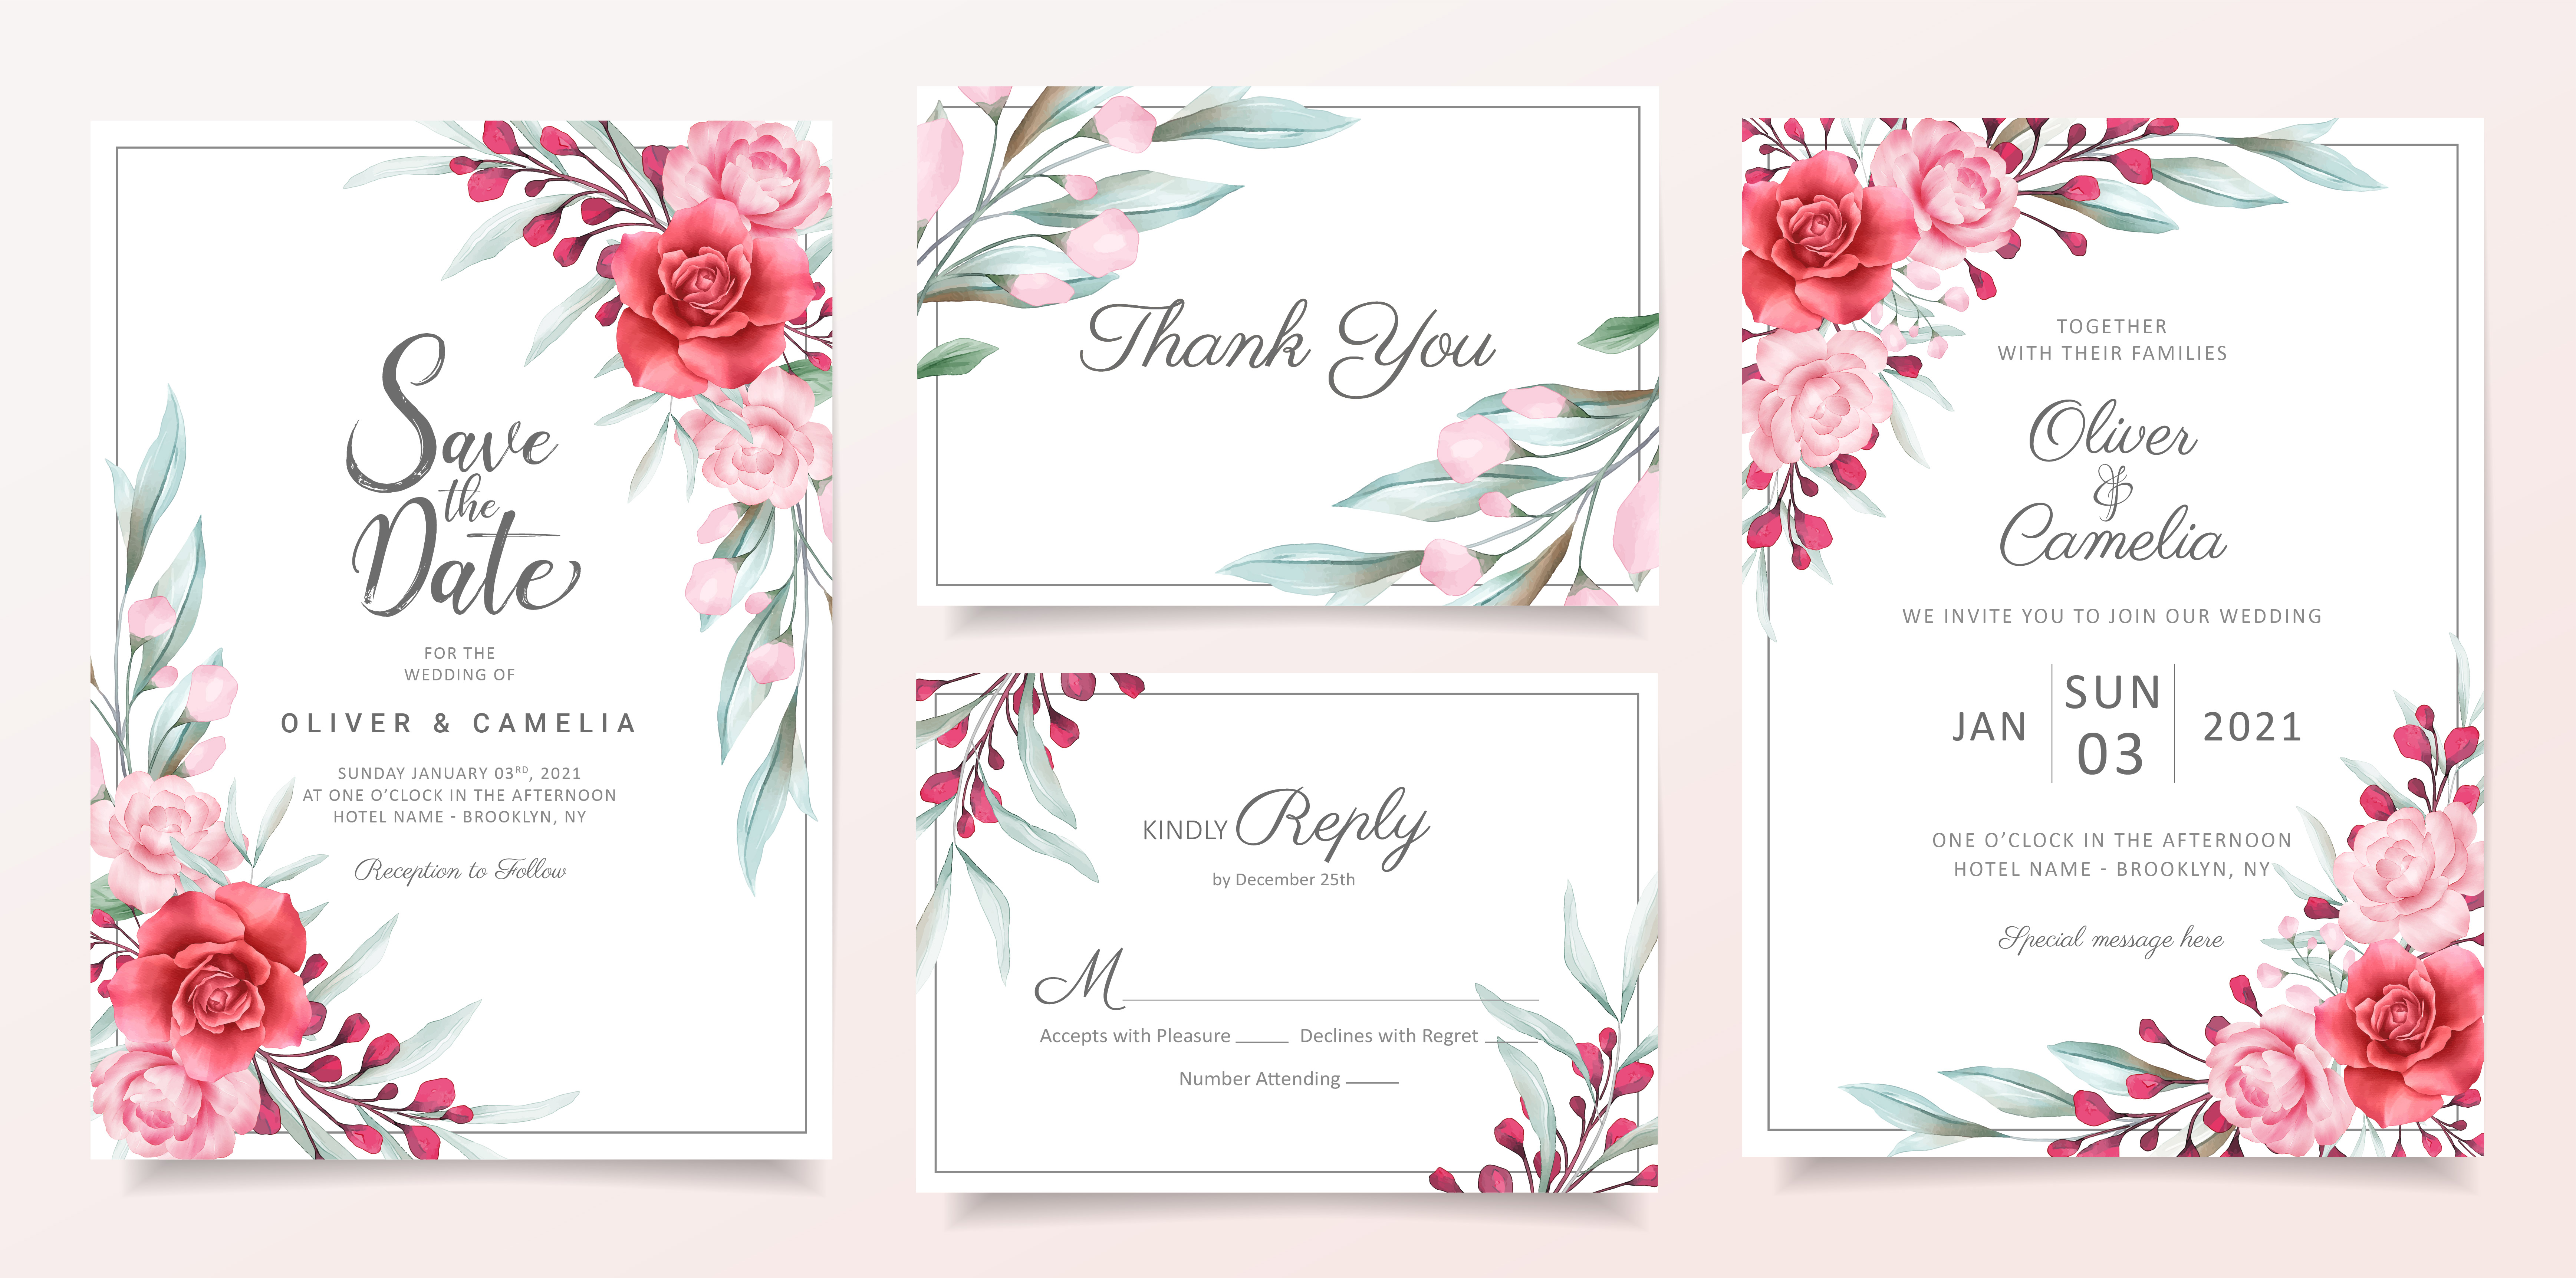 floral wedding invitation card template set  download